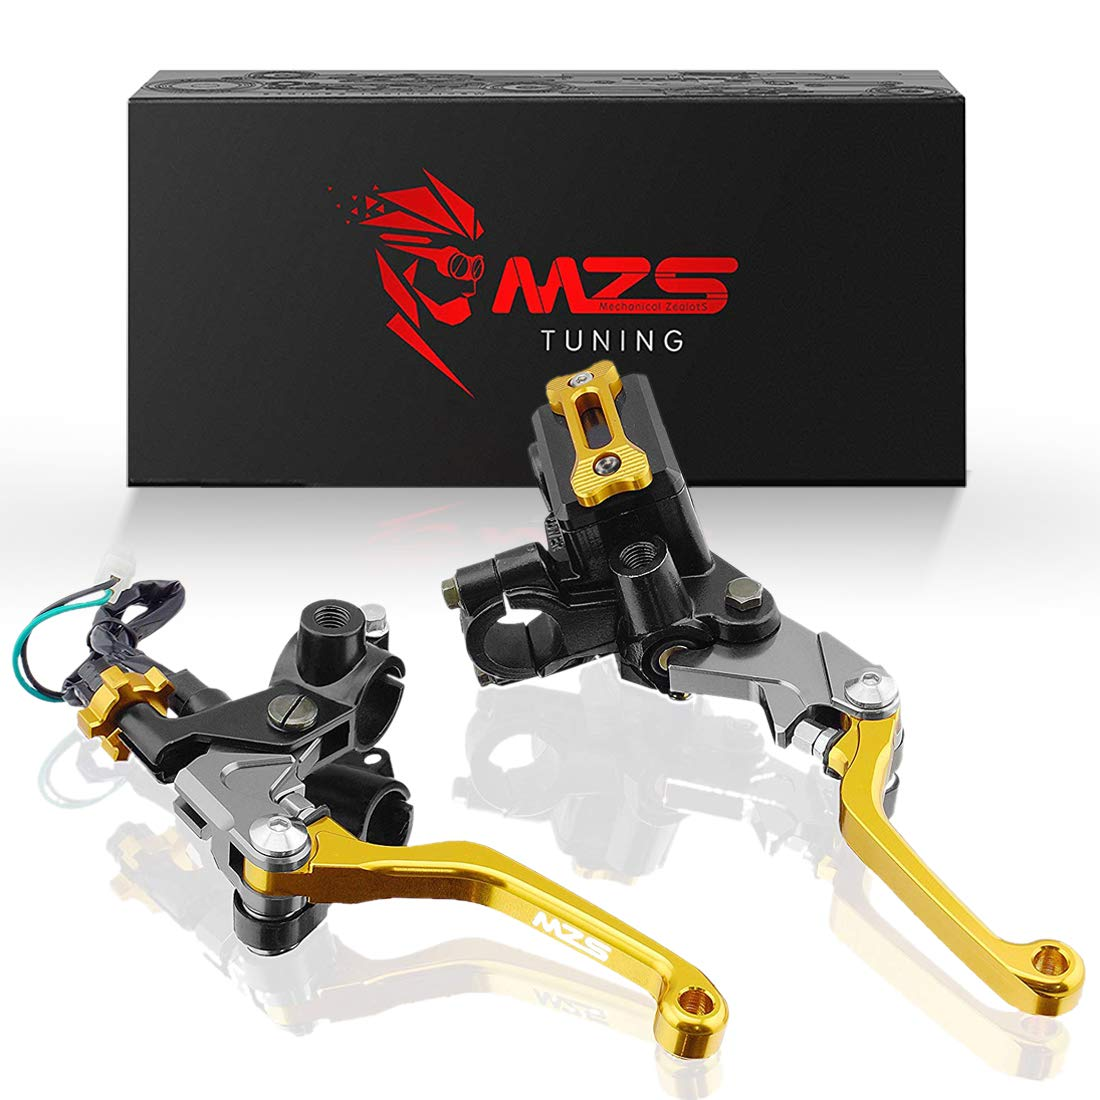 MZS 7/8'' Brake Master Cylinder Reservoir Pivot Levers for Honda Yamaha Suzuki Kawasaki KTM and more Gold